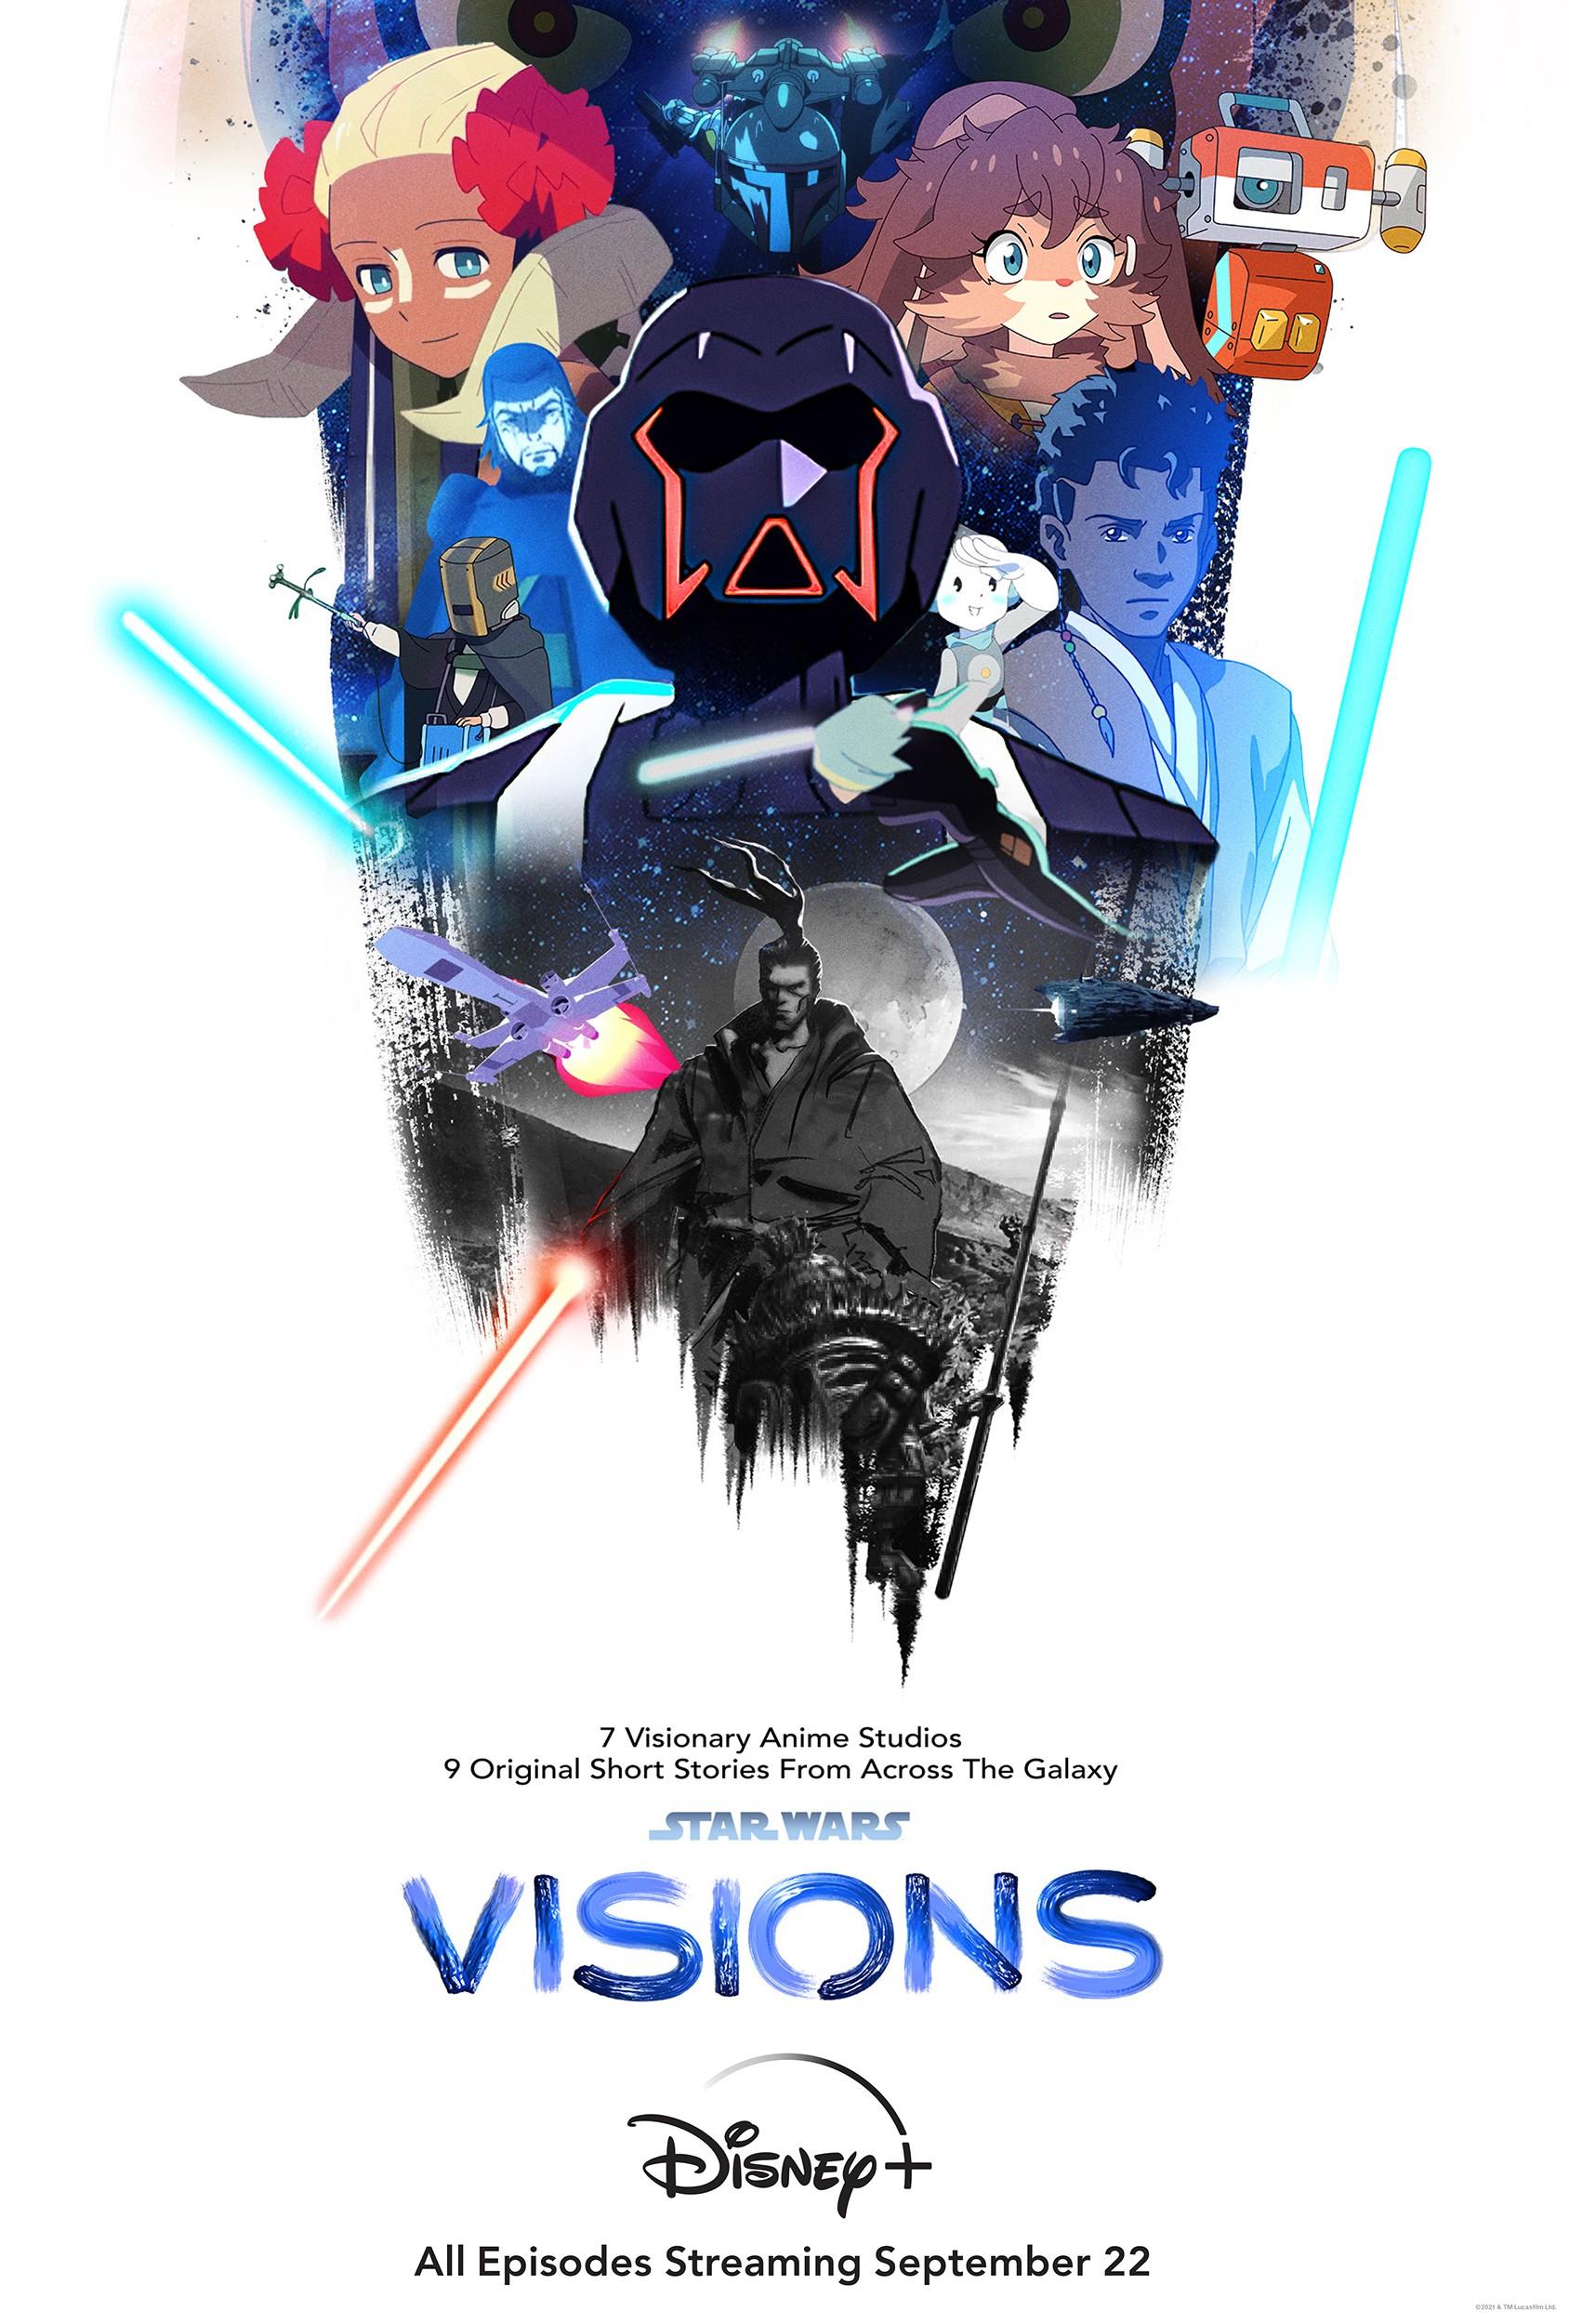 Star Wars: Visions plakat